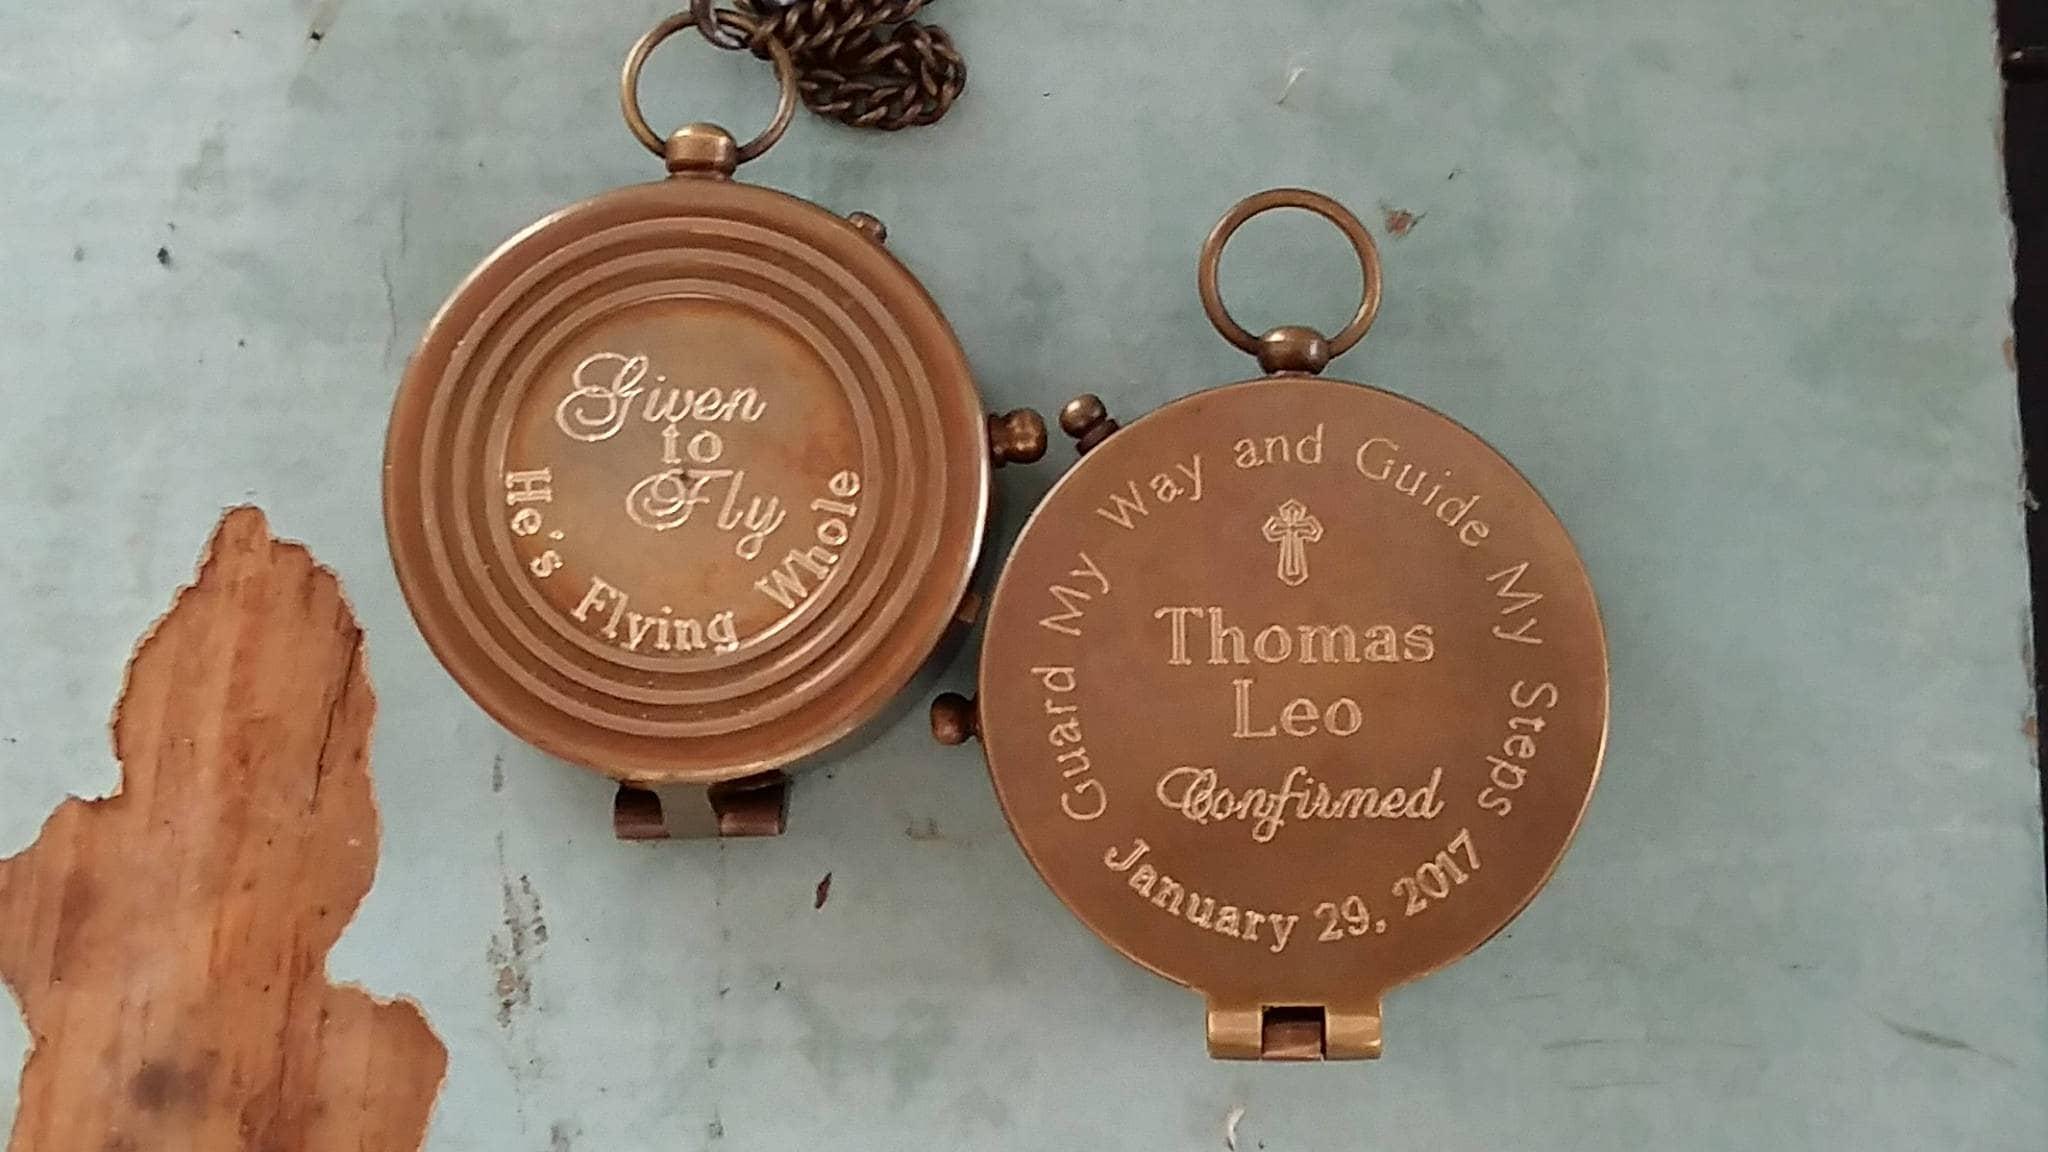 Engraved Compass Baptism Compass Boy Engraved Compass image 4